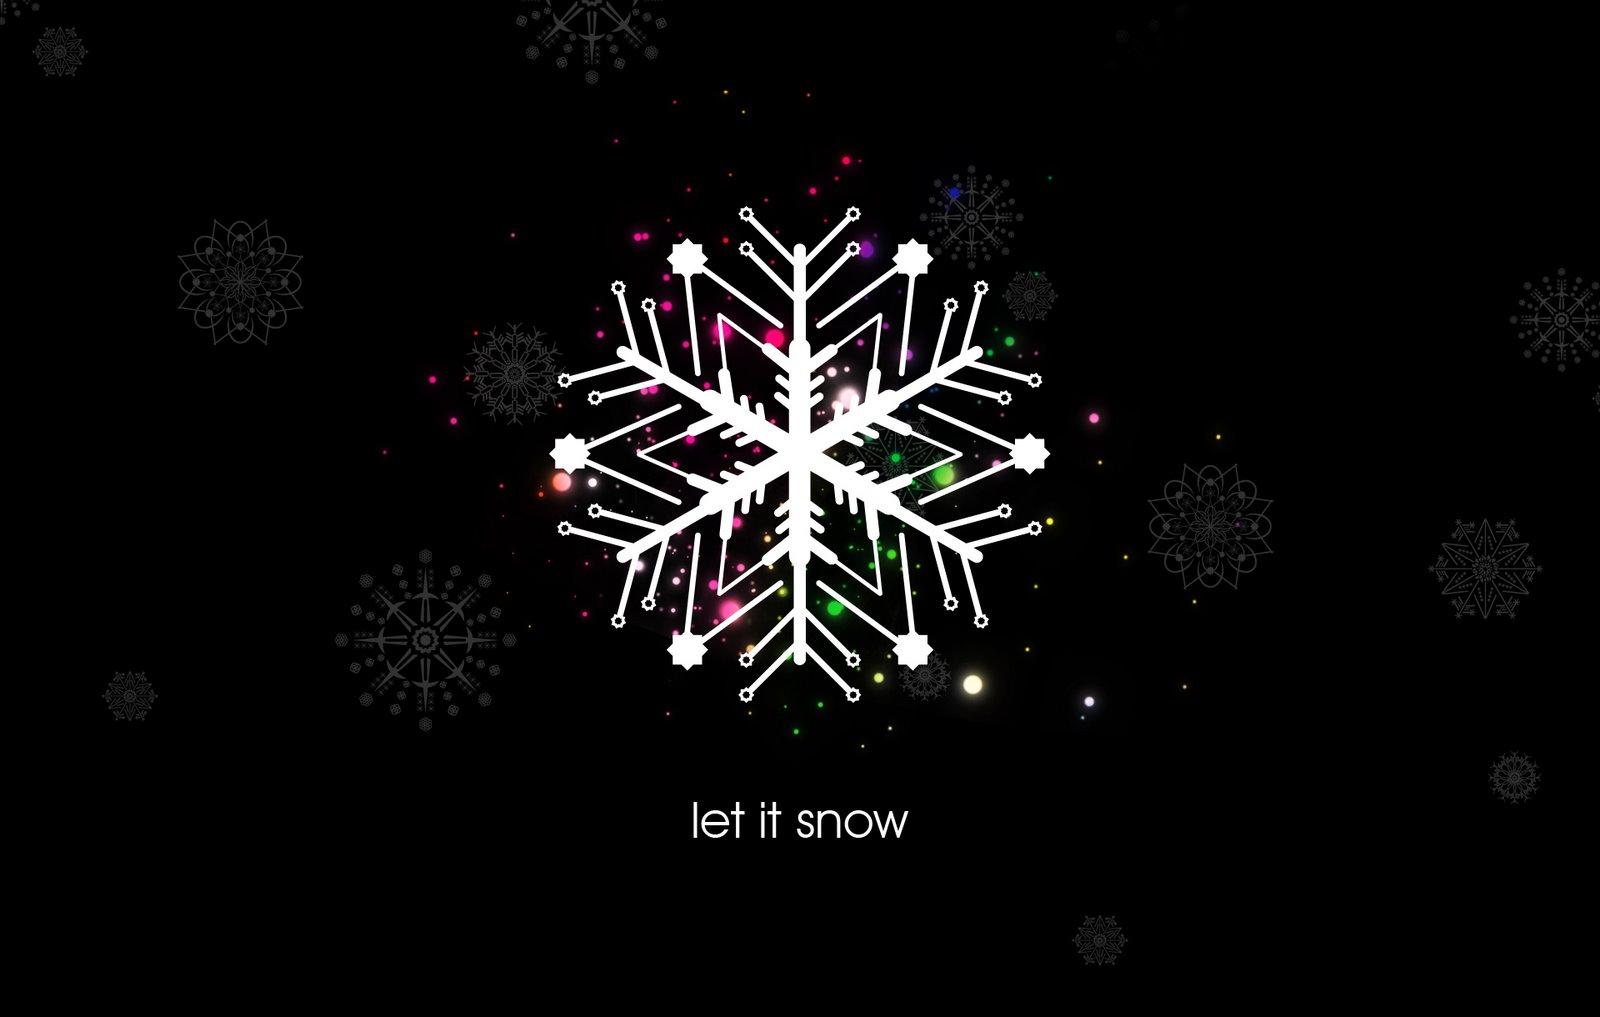 http://3.bp.blogspot.com/_SYei6mHCqrg/R1RMZGcwDQI/AAAAAAAAAMg/auA3GWx7M9A/s1600-R/snow_desktop1.jpg